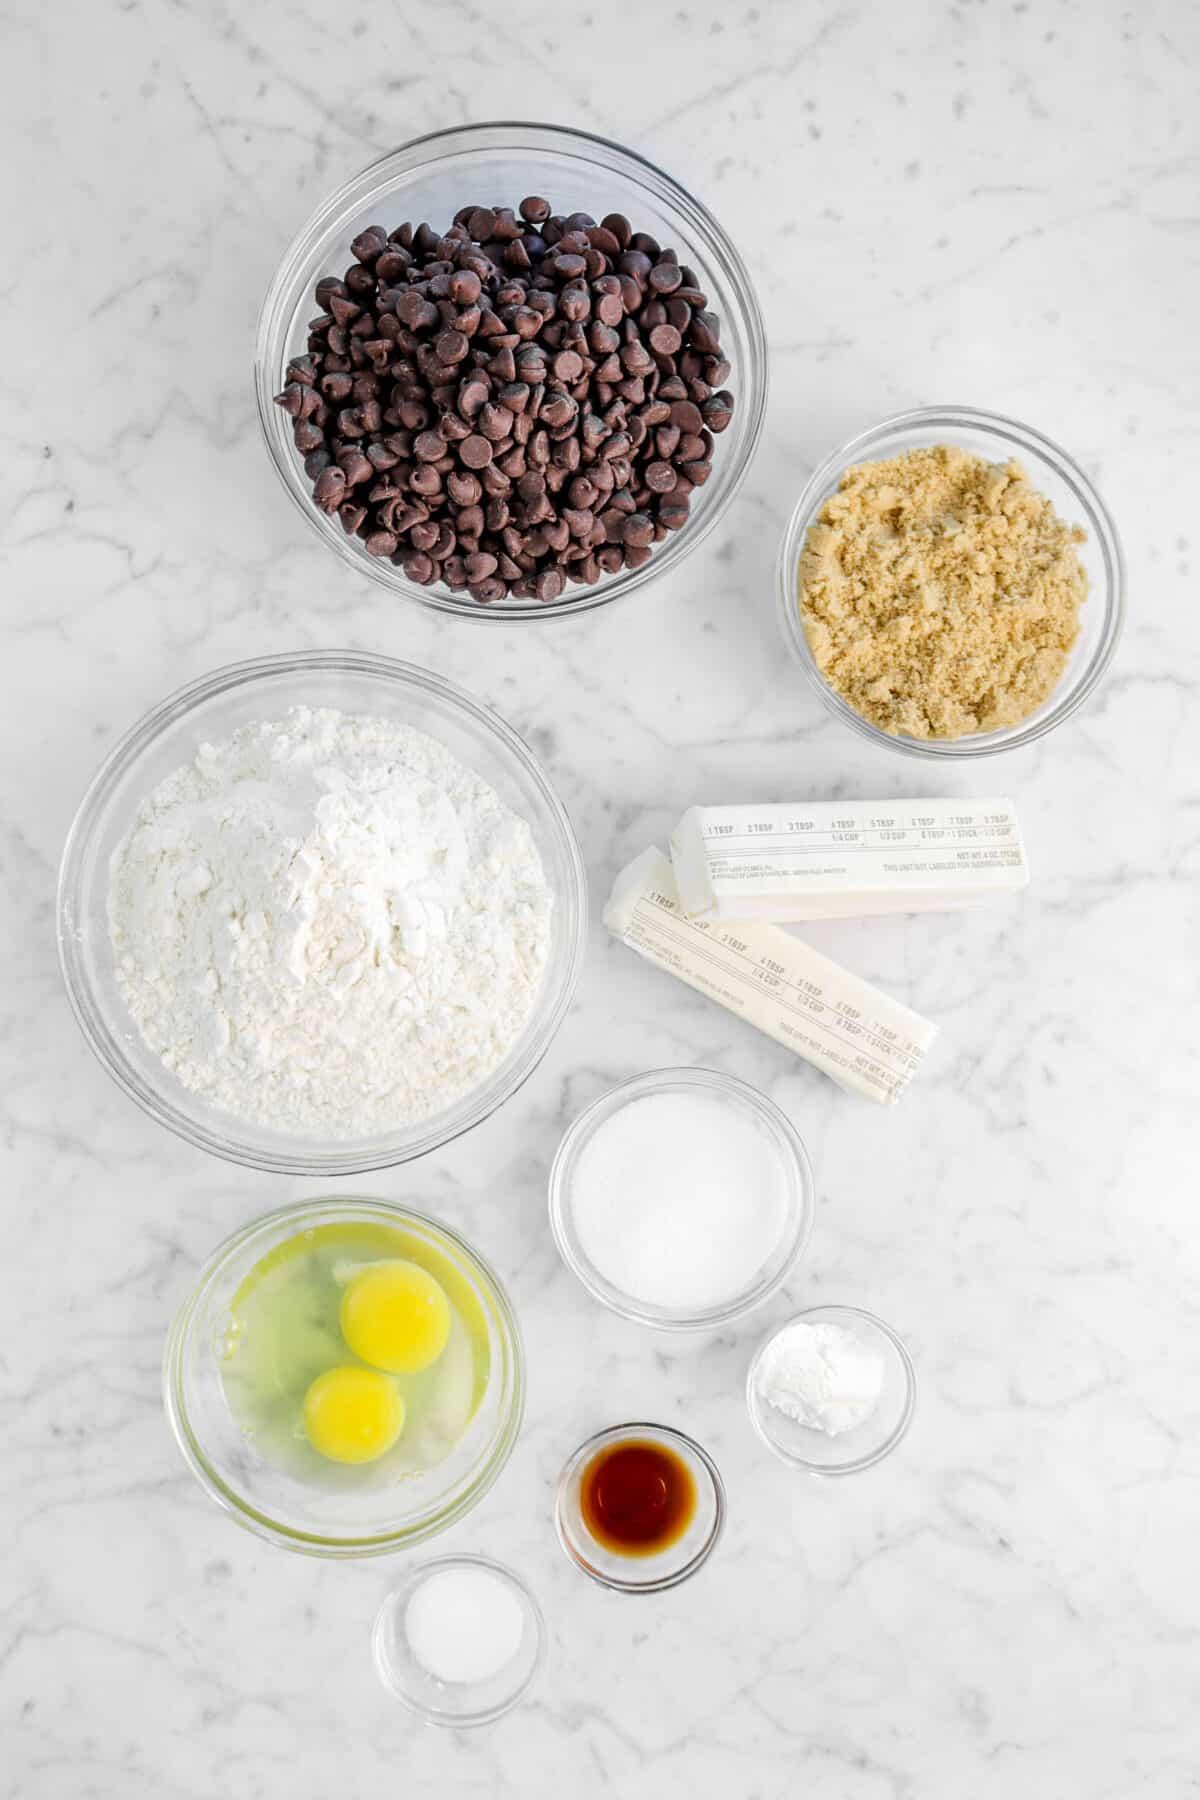 chocolate chips, brown sugar, flour, butter, sugar, eggs, baking powder, vanilla, and salt on a marble counter